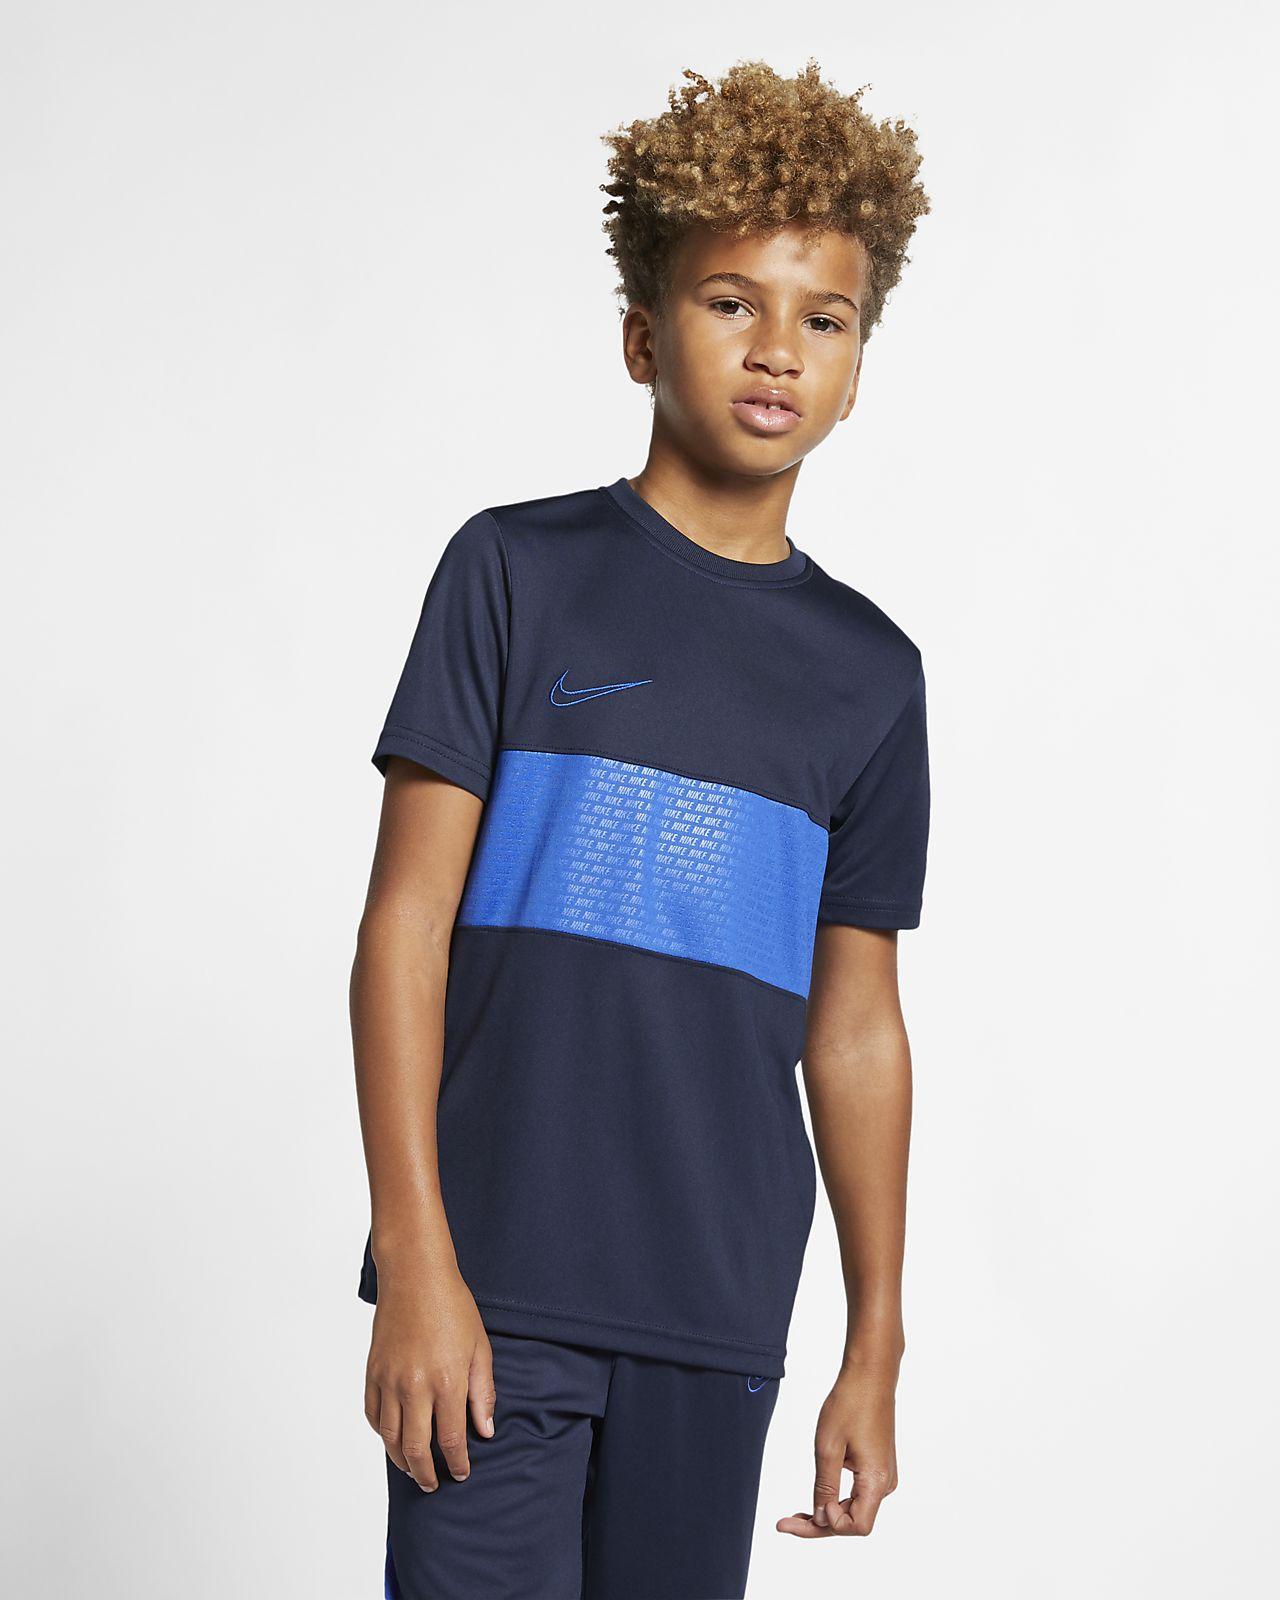 Nike Dri-FIT Academy Kısa Kollu Genç Çocuk Futbol Üstü